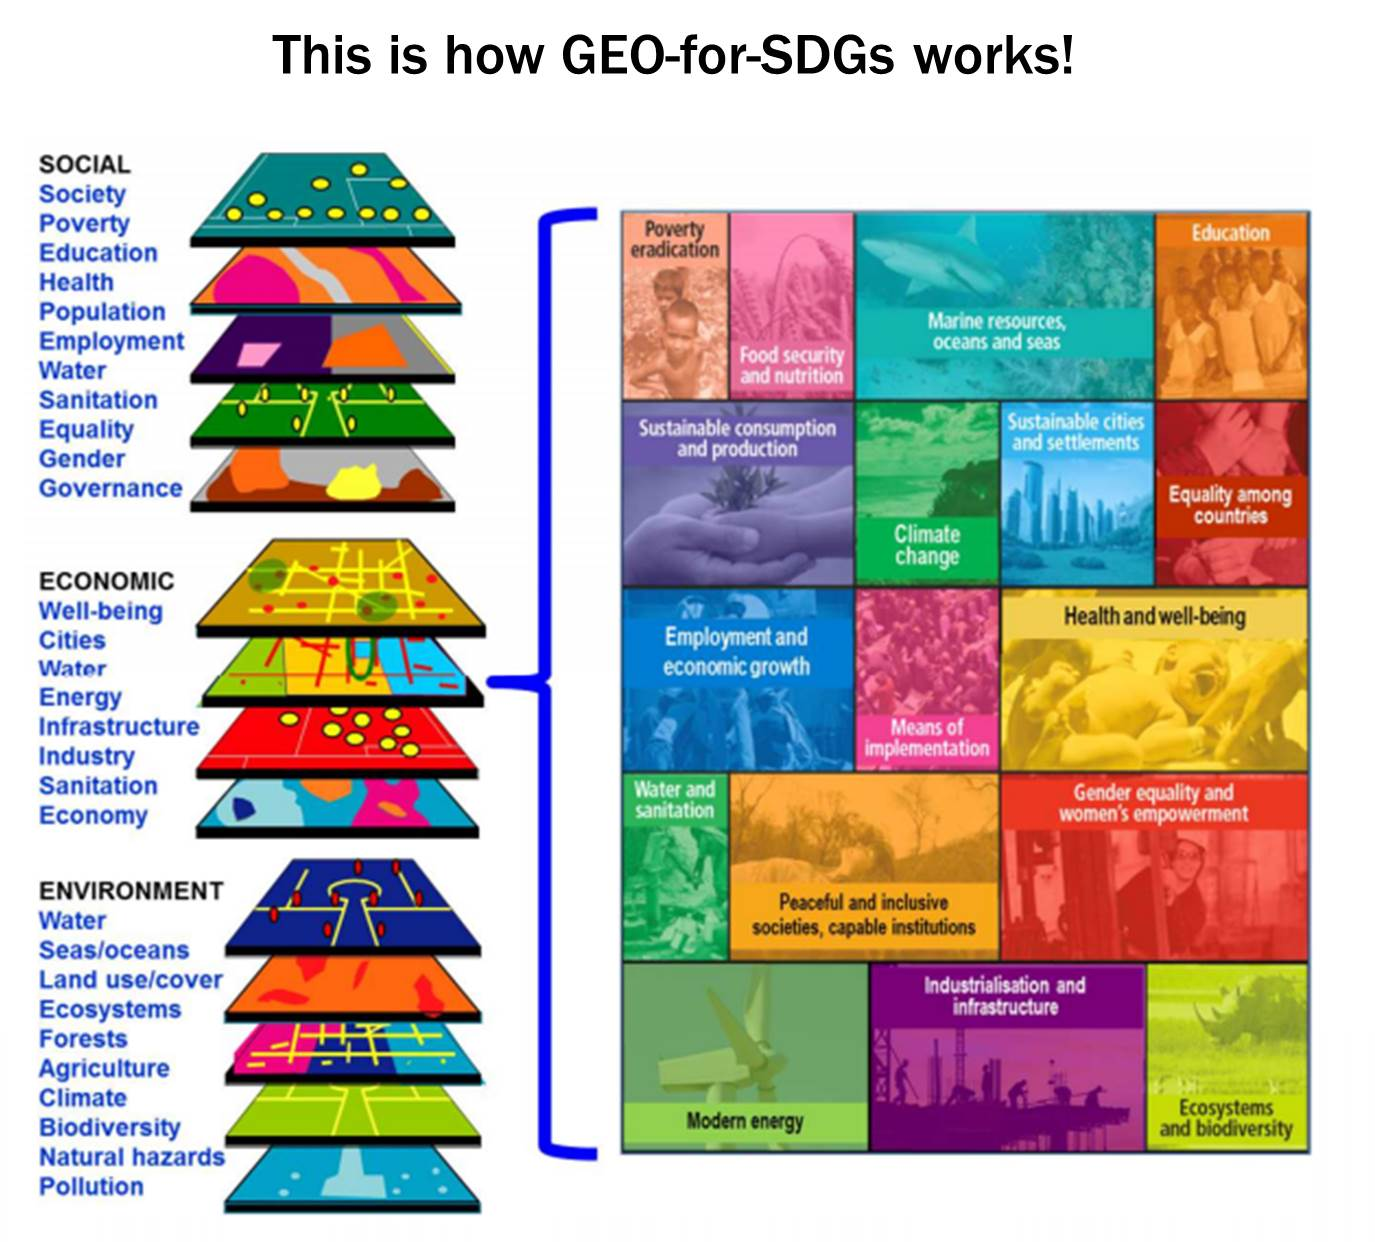 geo-for-sdgs